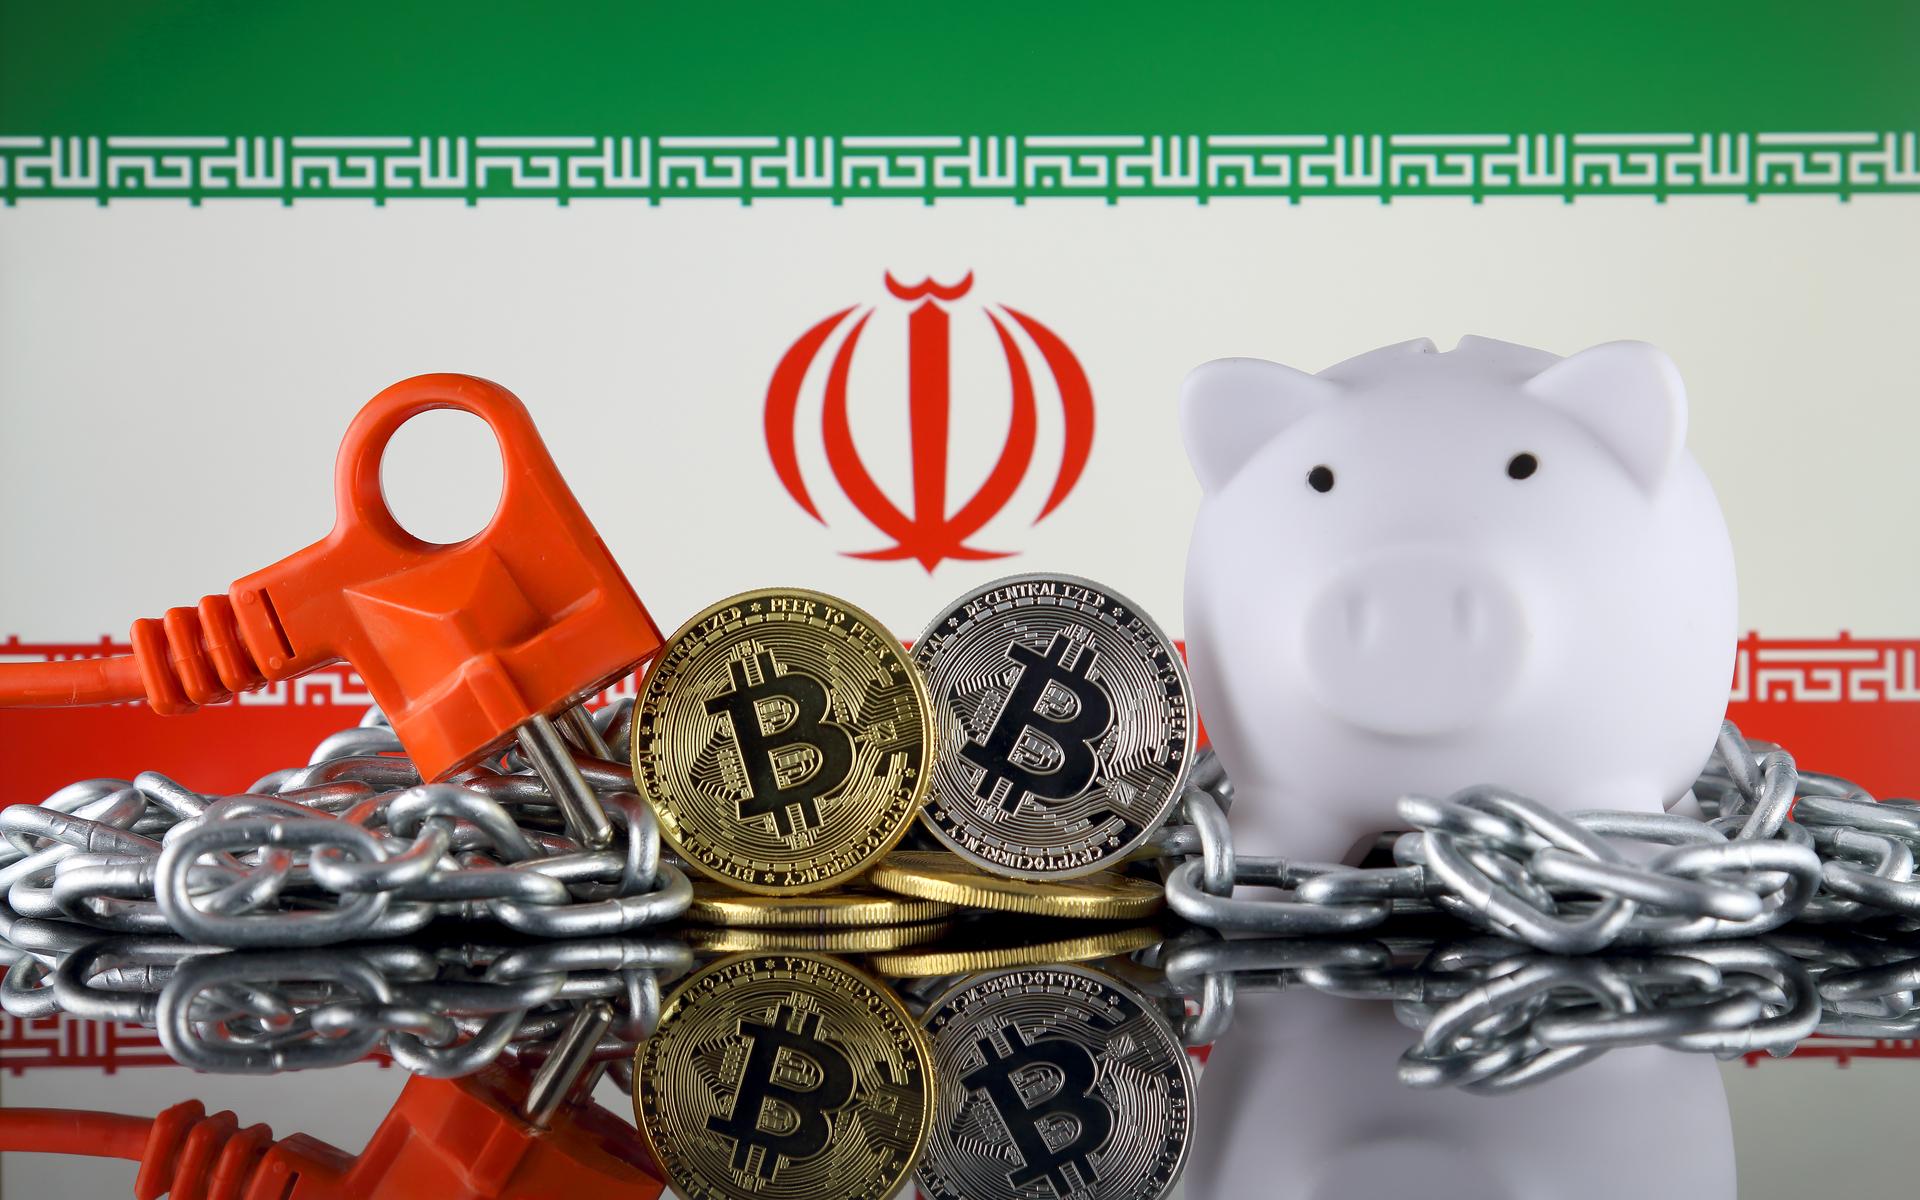 BTC mining - در پی ورود دولت ایران به صنعت ماینینگ، هش ریت بیت کوین افزایش یافت